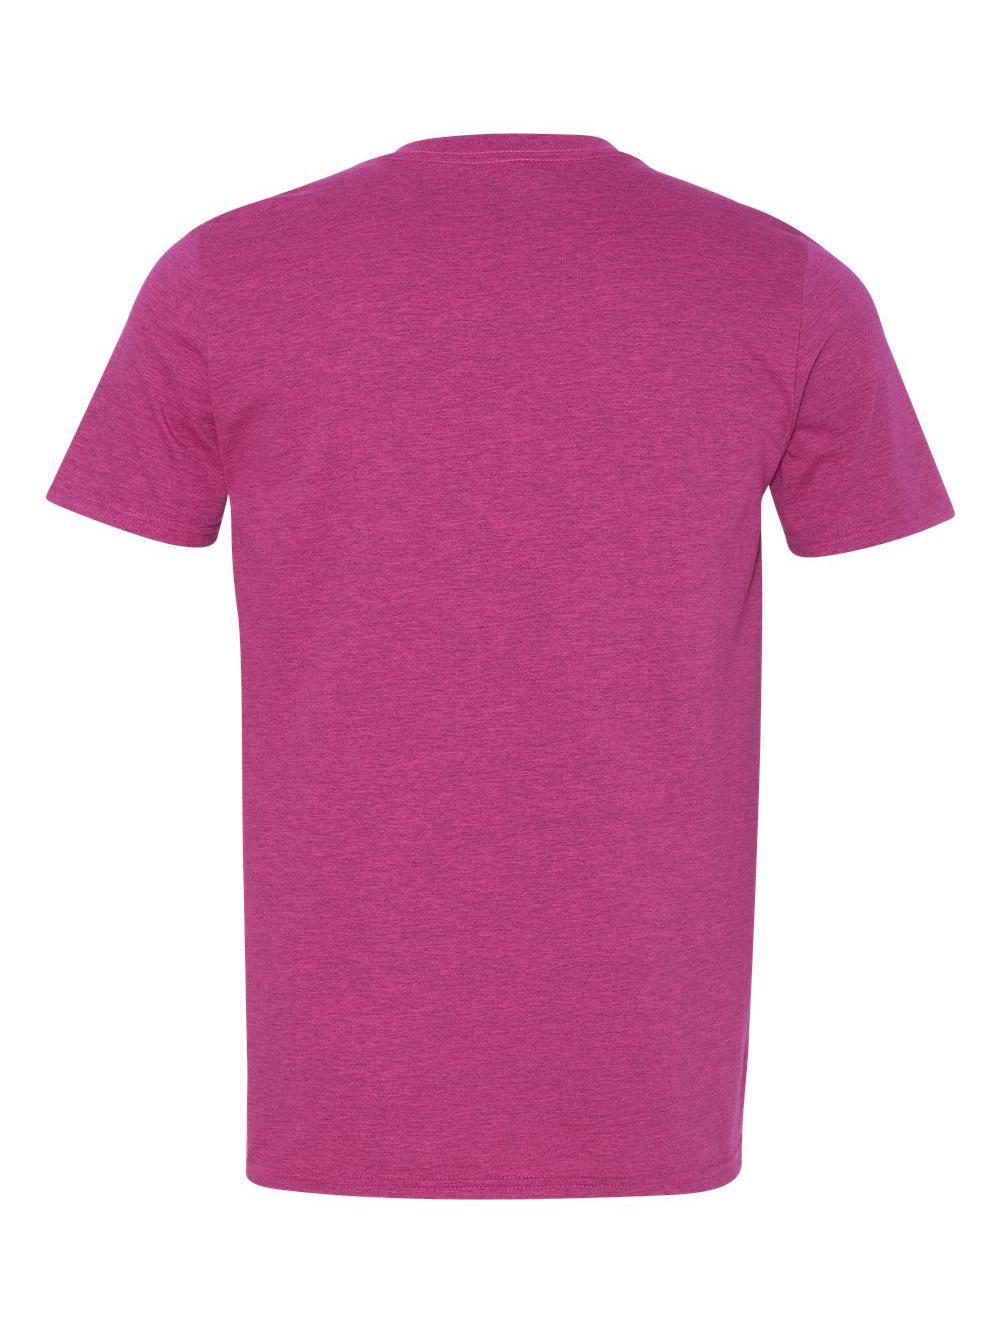 Gildan-Softstyle-T-Shirt-64000 thumbnail 7